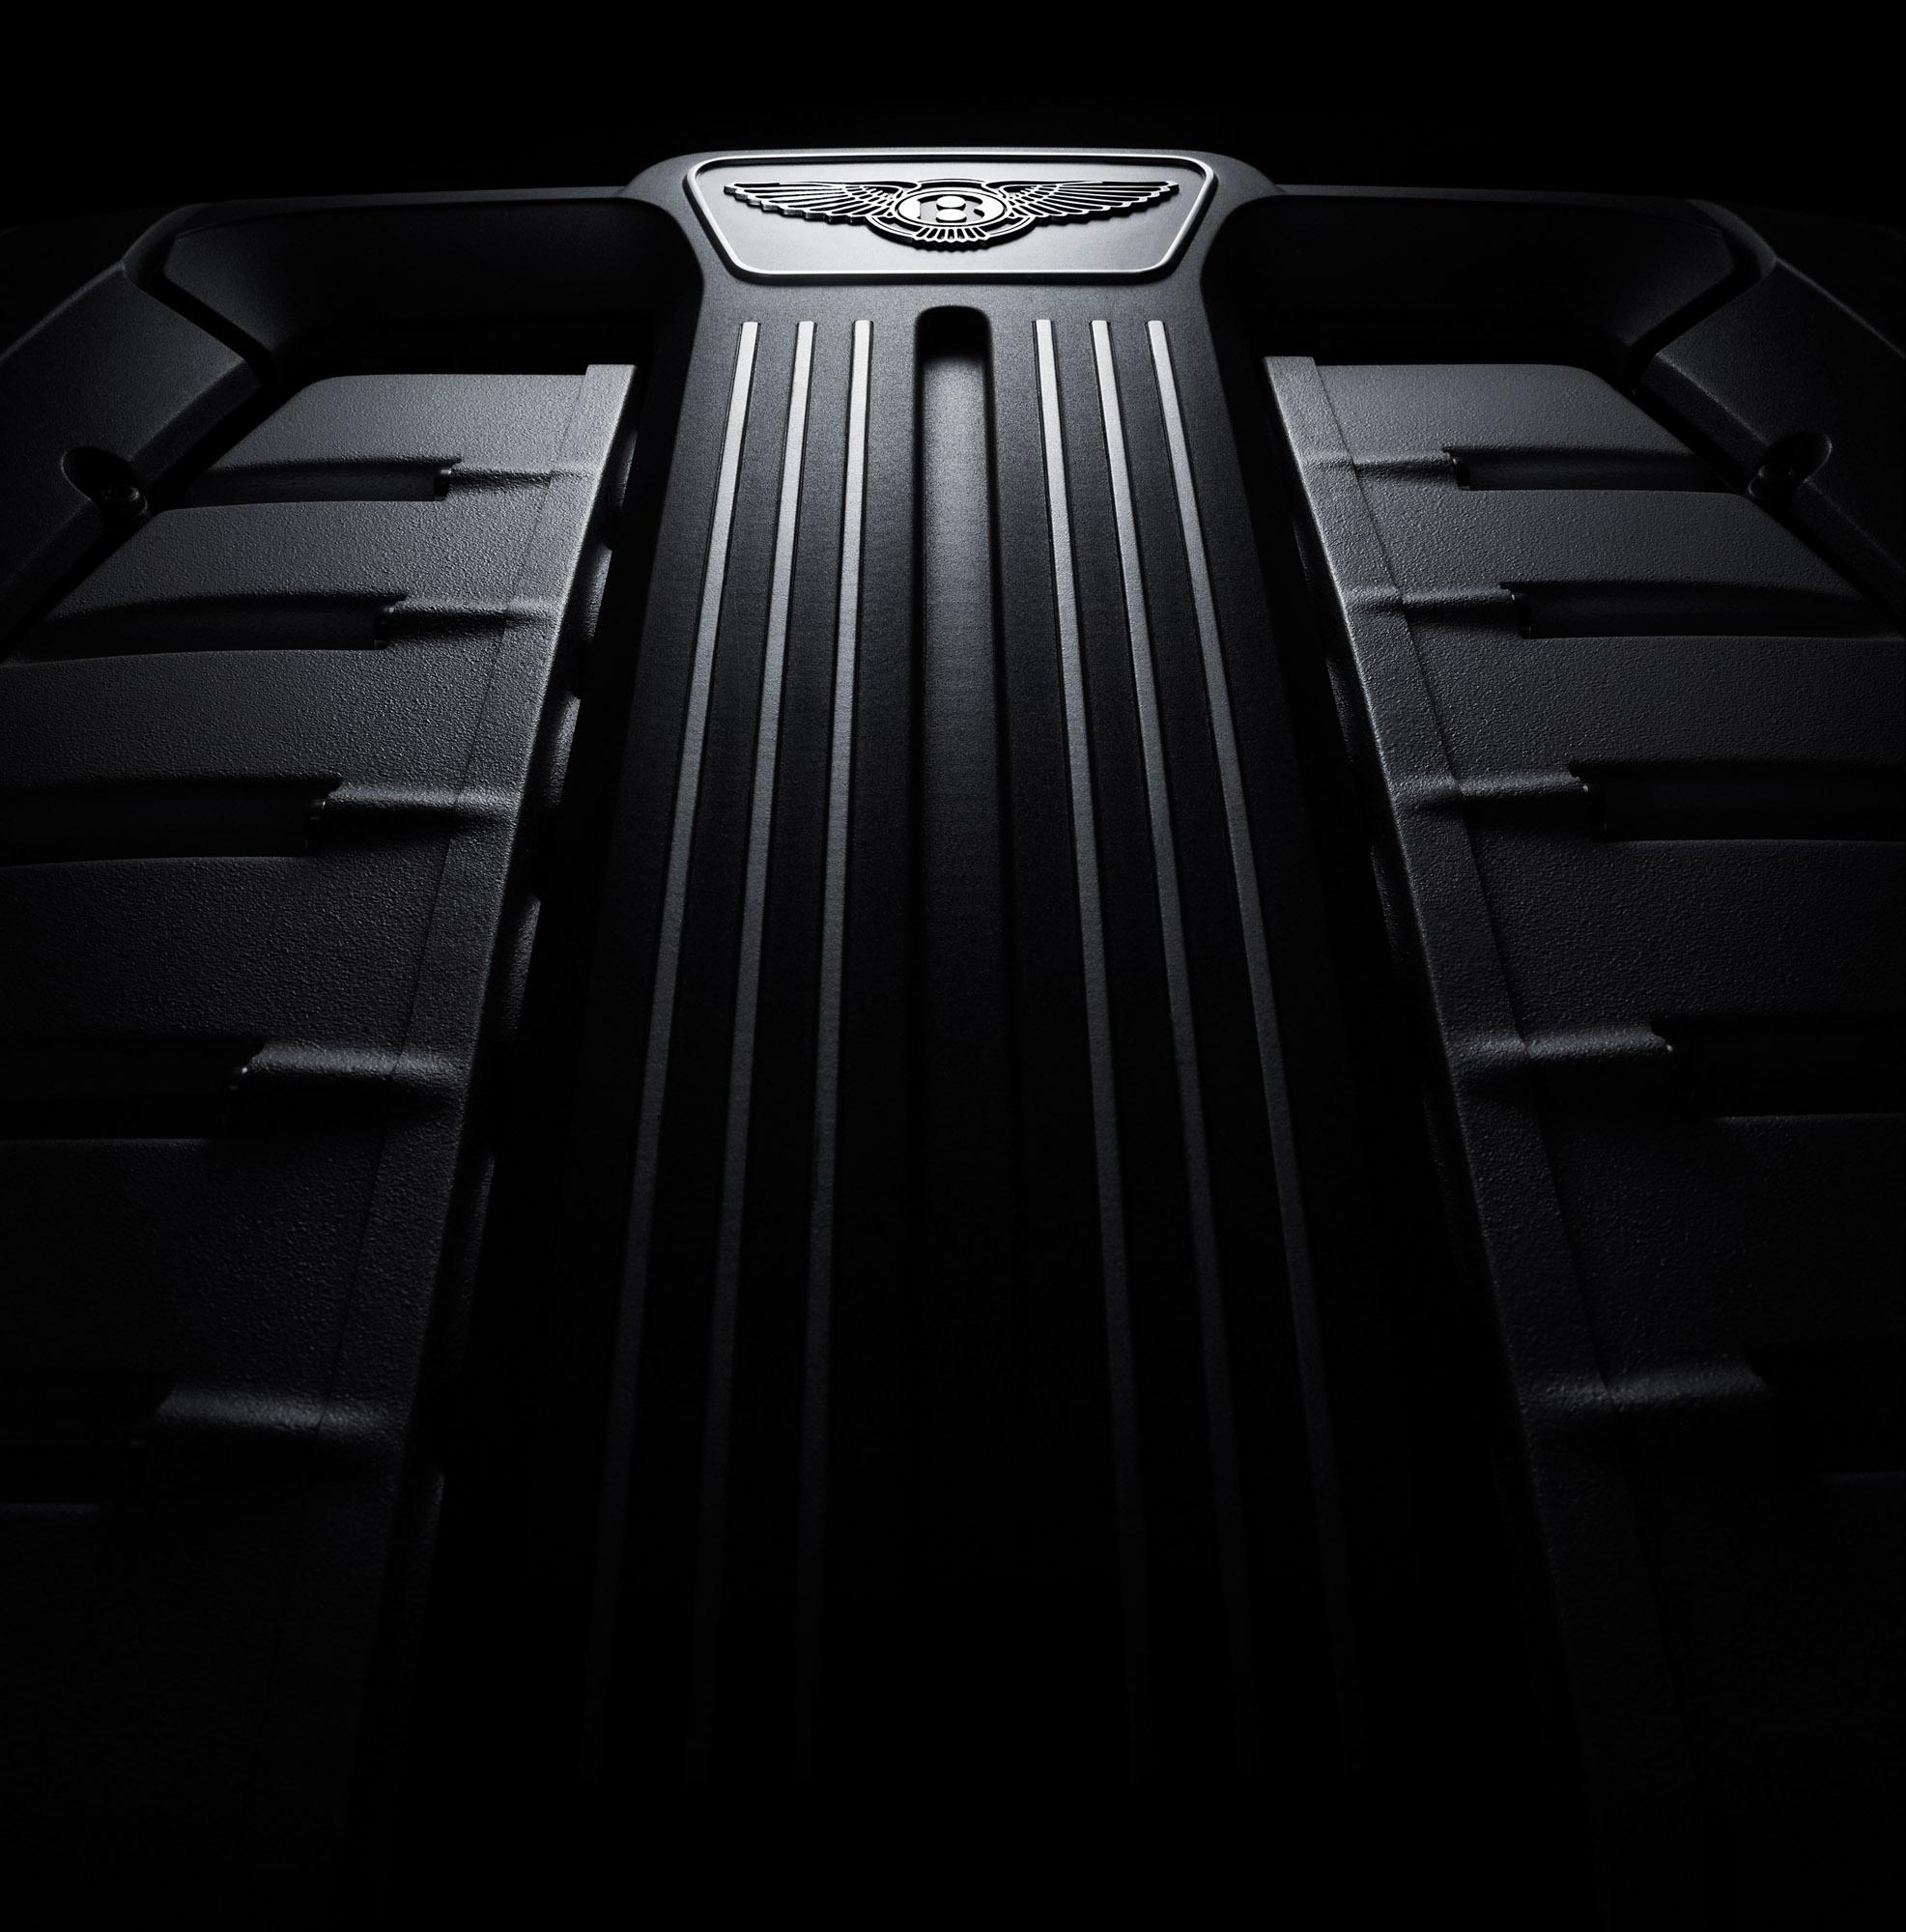 Wallpaper Bentley Continental Gt Black Edition 2017: PRIOR-DESIGN Black Edition V3 Widebody Aero-Kit For